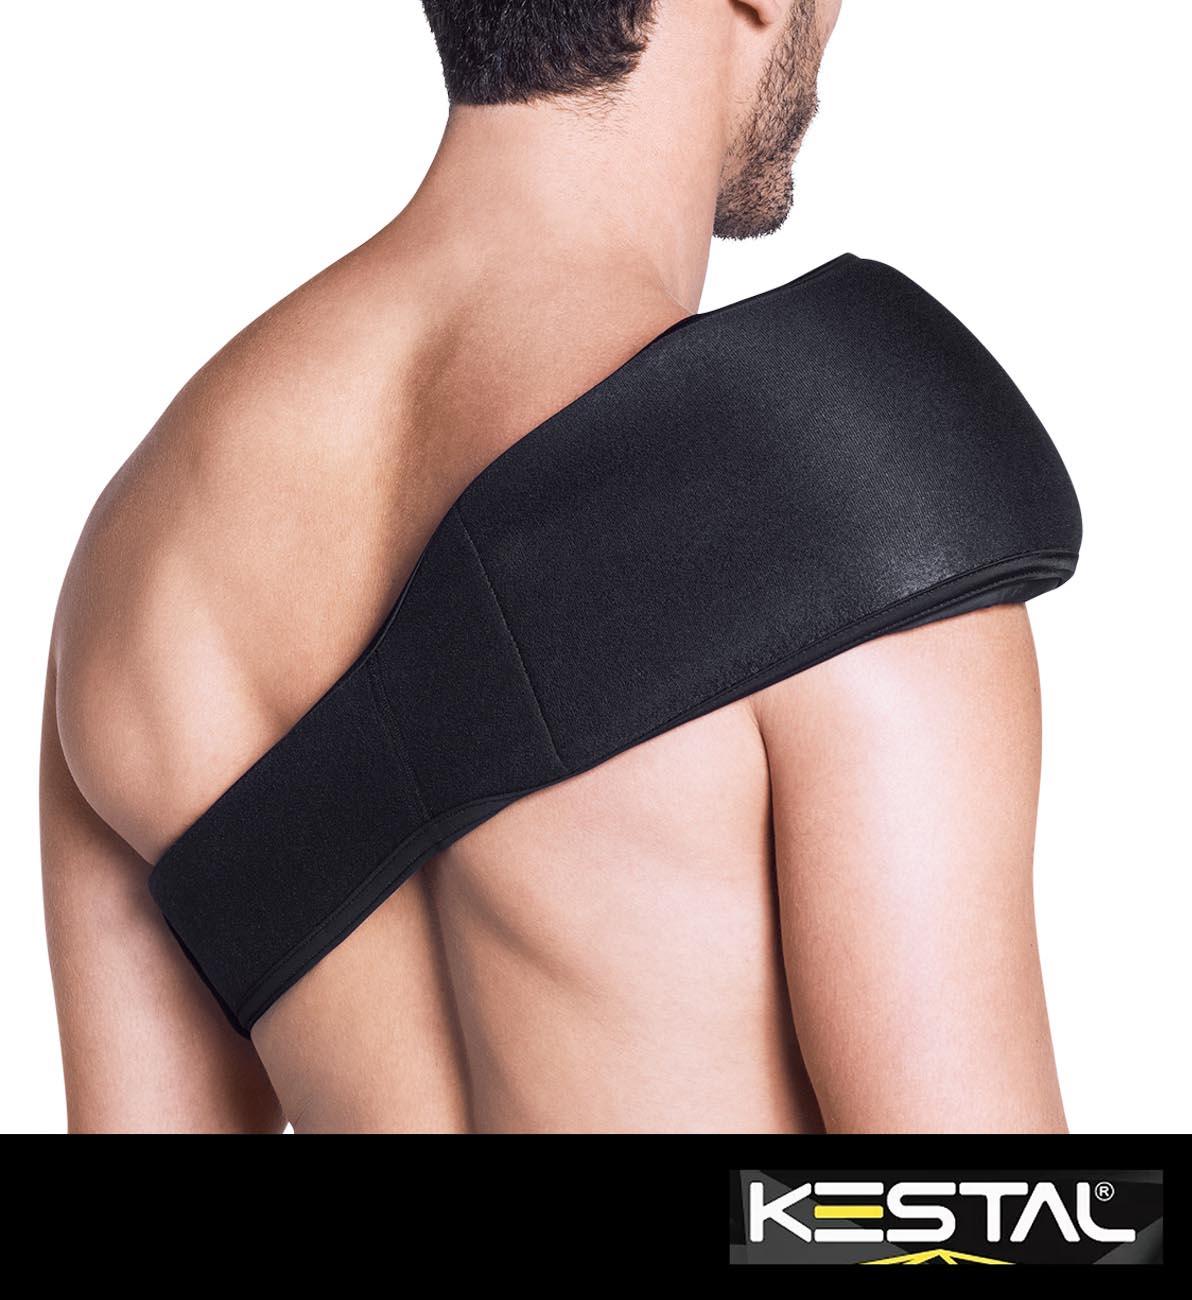 Suporte Para Bolsa Térmica Gel Longo (KSN024) - Kestal